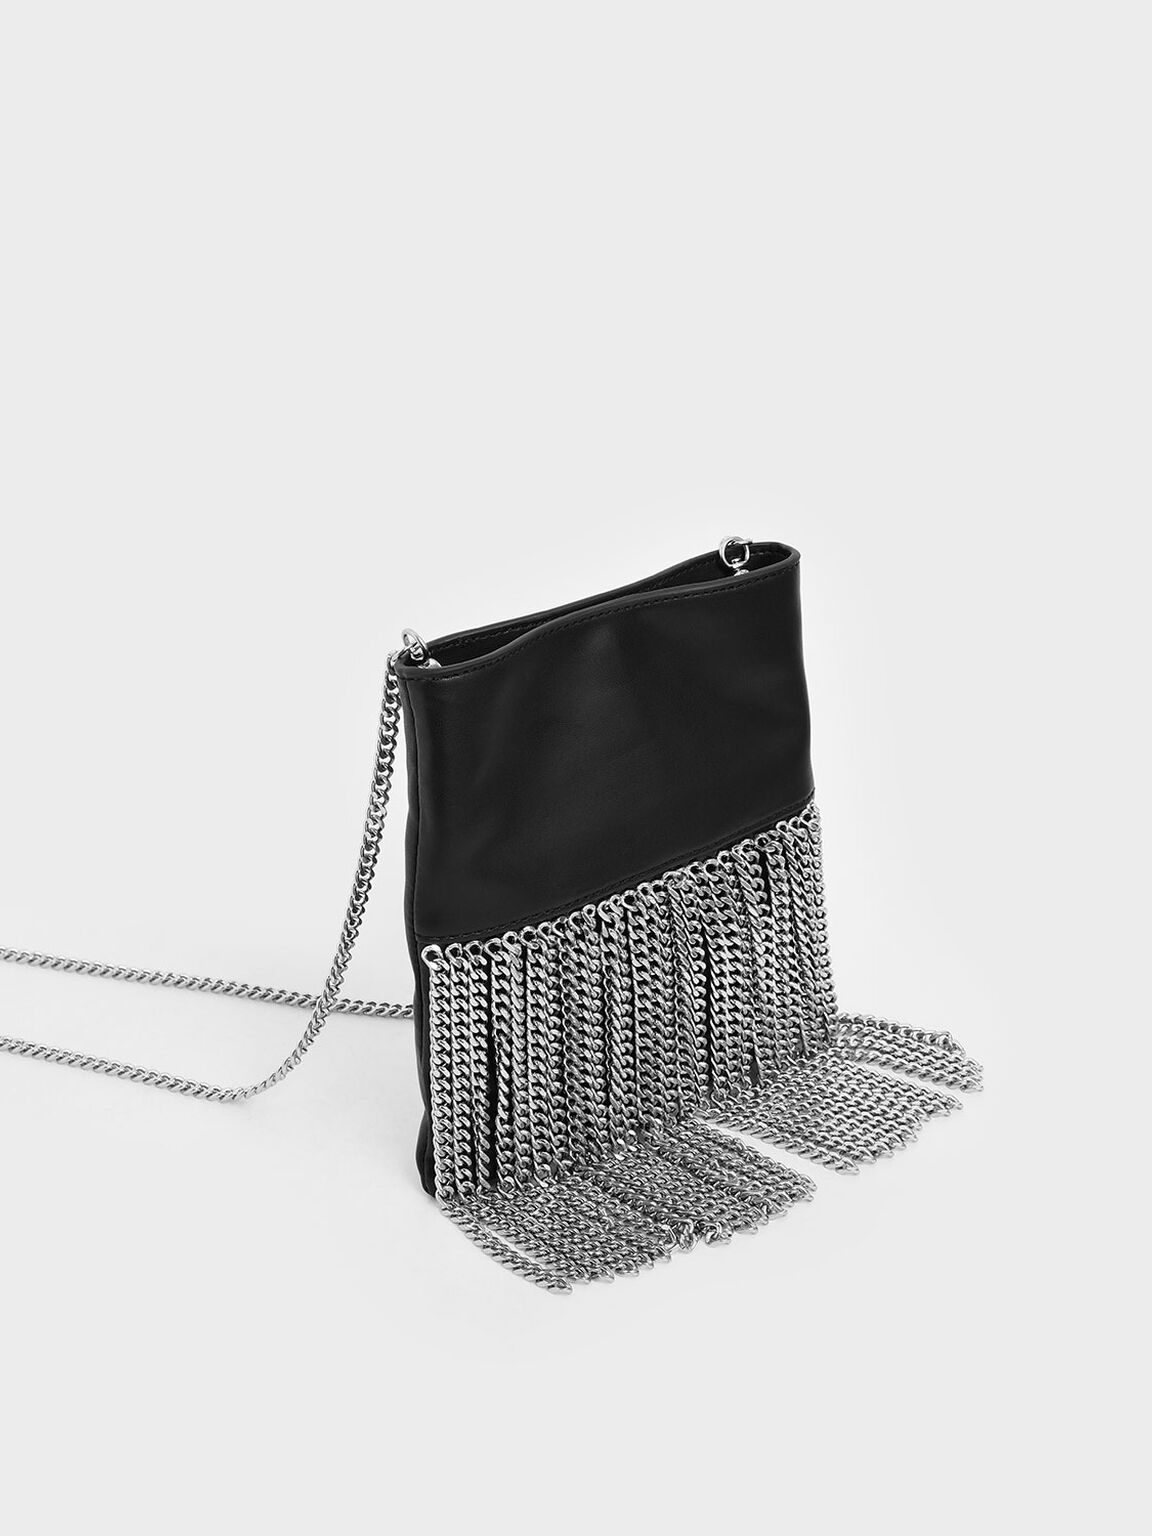 Chain Fringe Mini Crossbody Bag, Black, hi-res